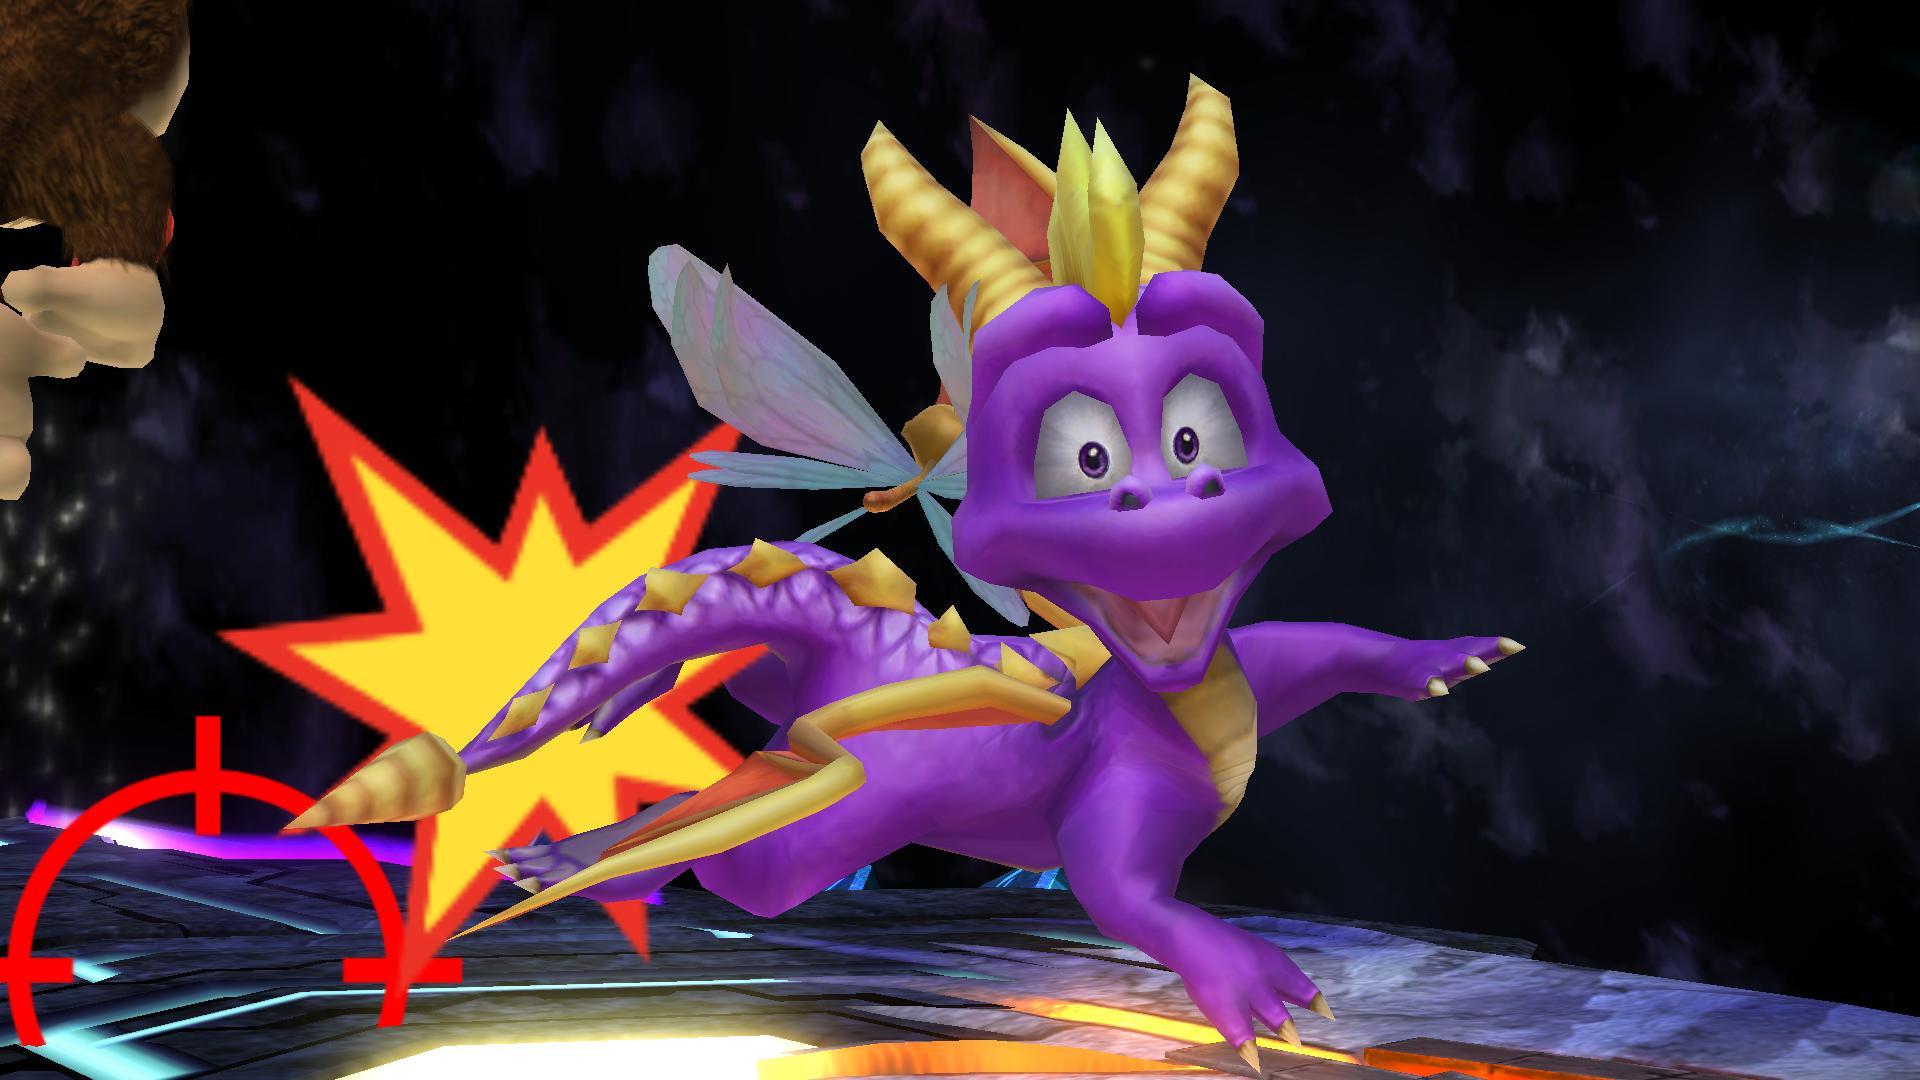 Spyro And Sparx Super Smash Bros Wii U Works In Progress